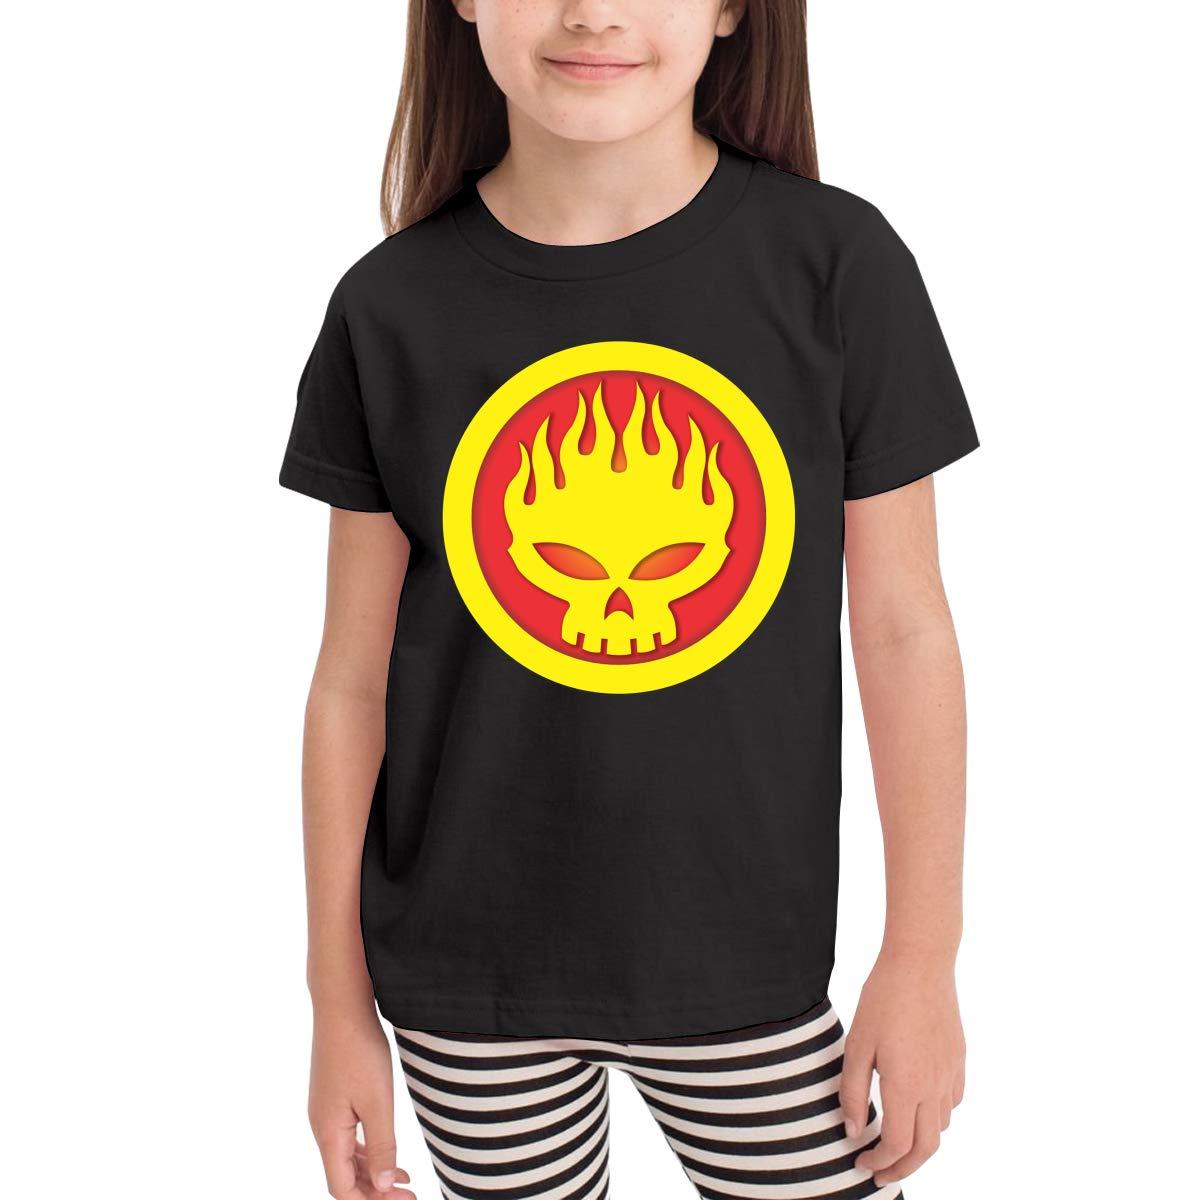 SuperLee Boys Girls Kids The Offspring Soft Short Sleeve T-Shirt Black